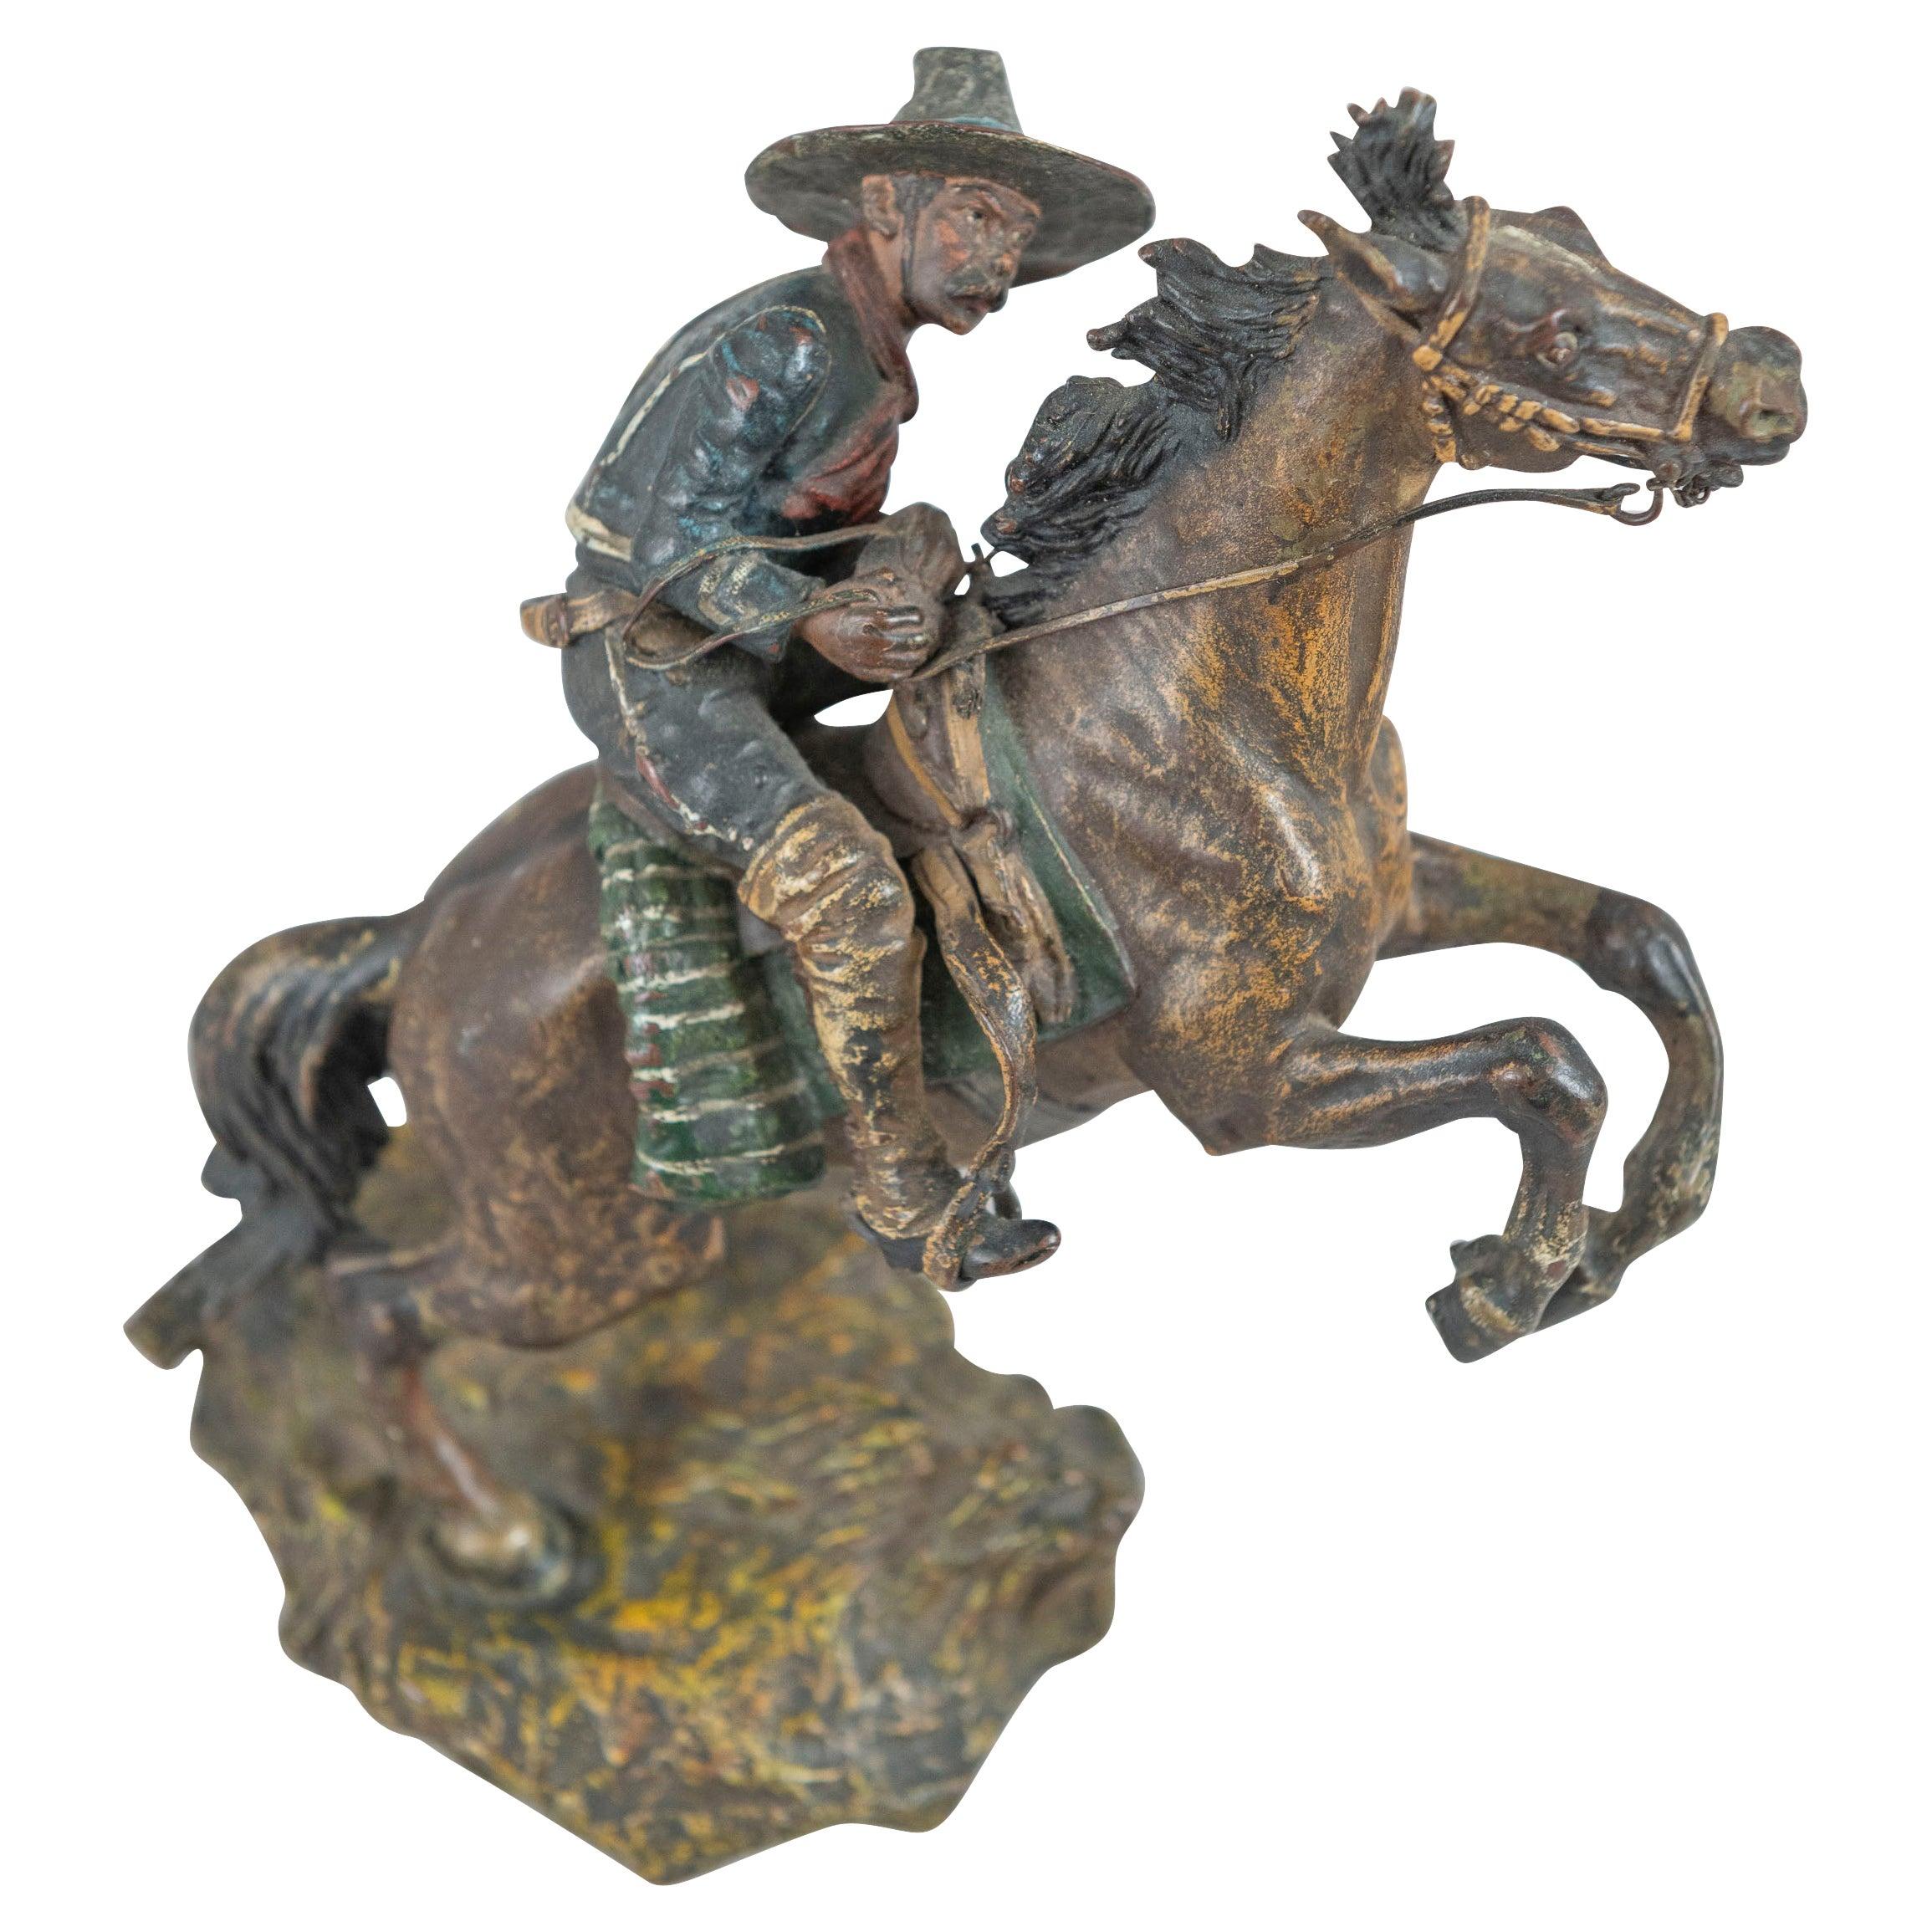 Cold Painted Vienna Bronze Caballero on Horseback, Carl Kauba, ca. 1900